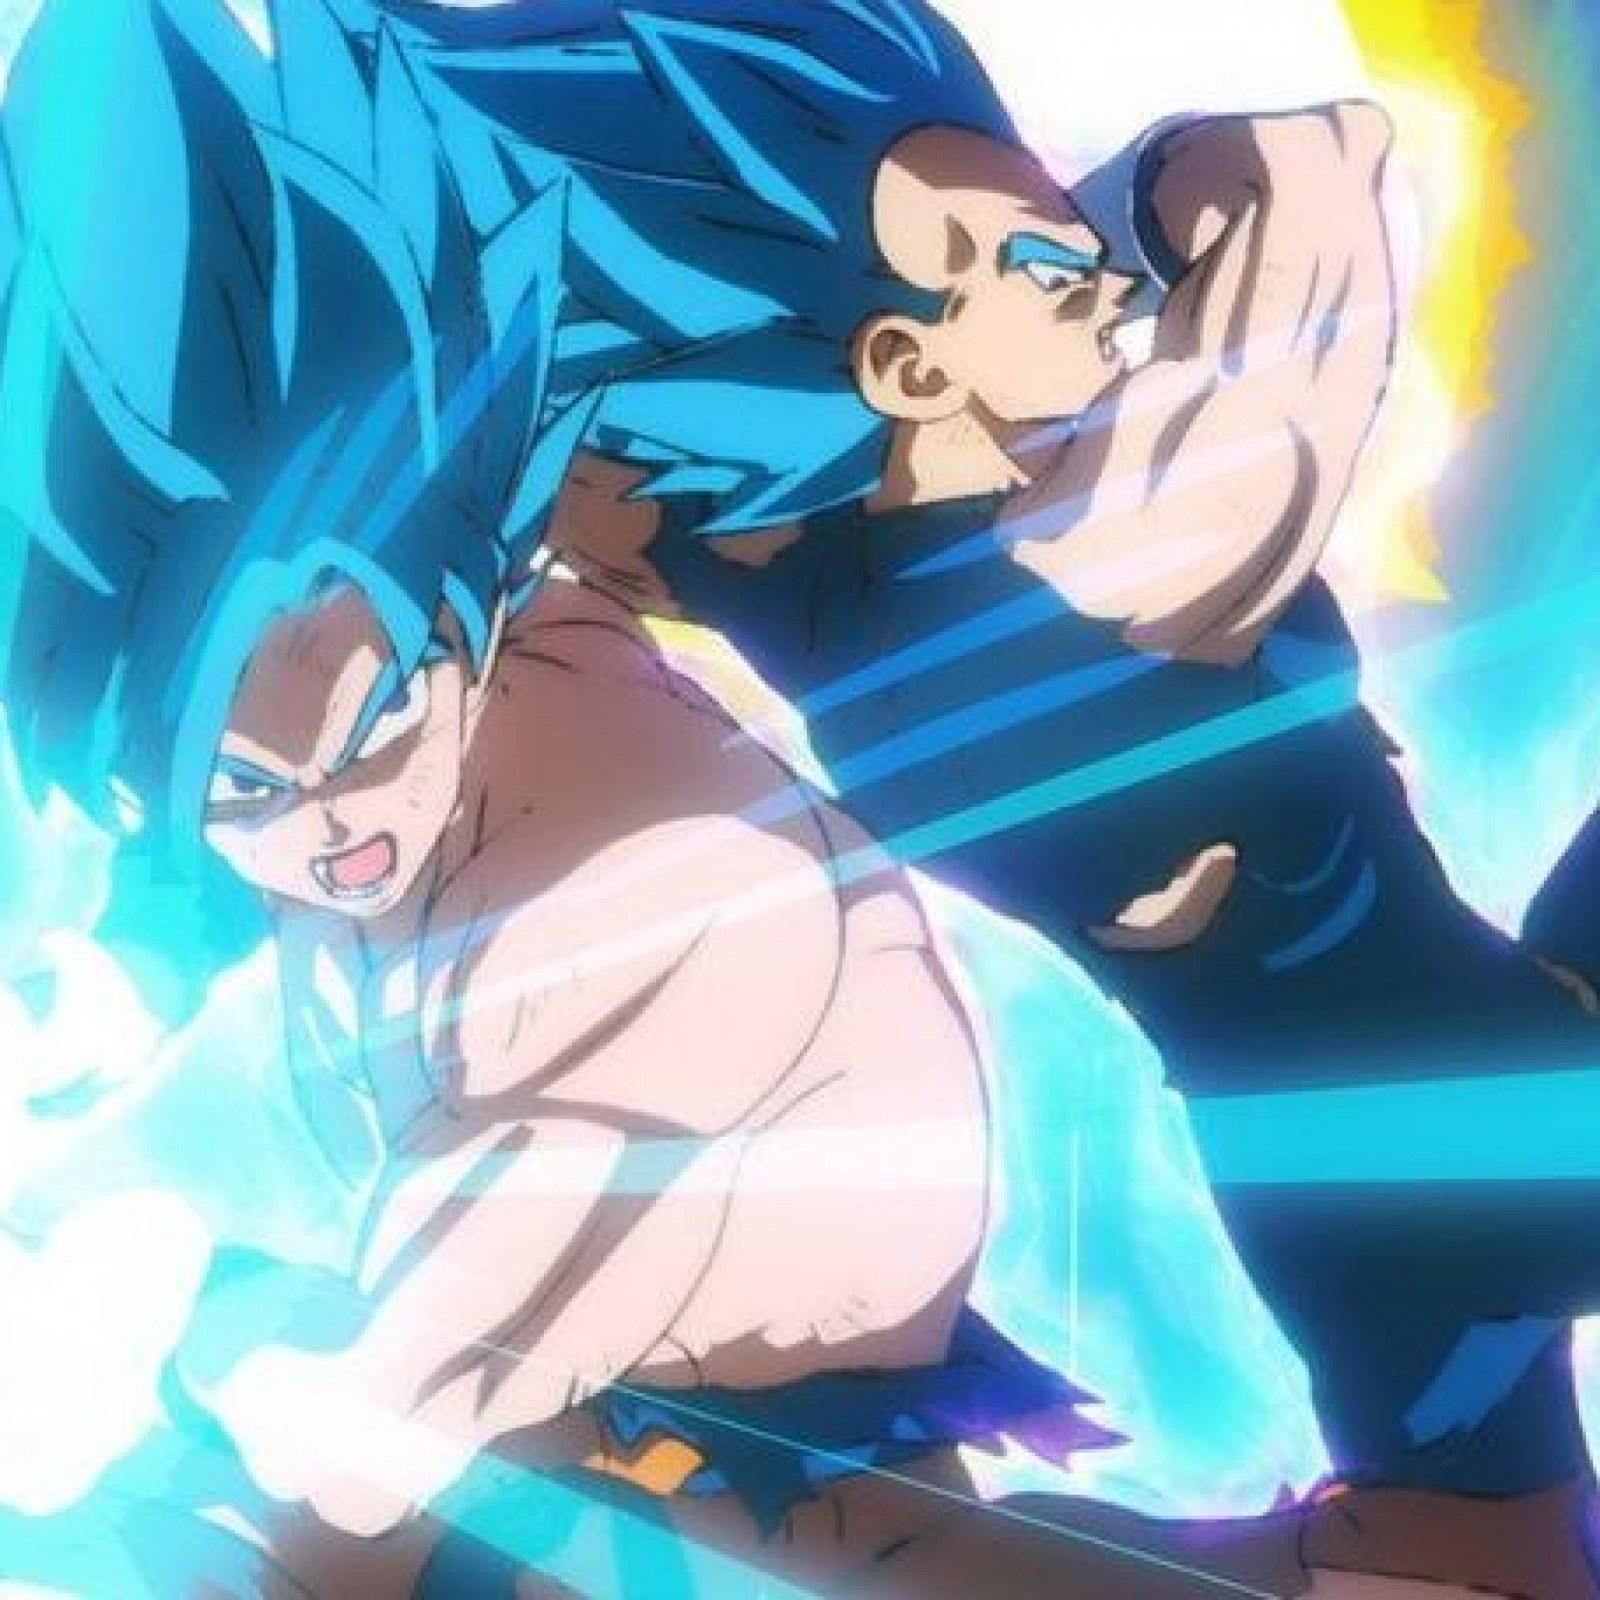 New Dragon Ball Super Broly Clip Reveals Gogeta In Action